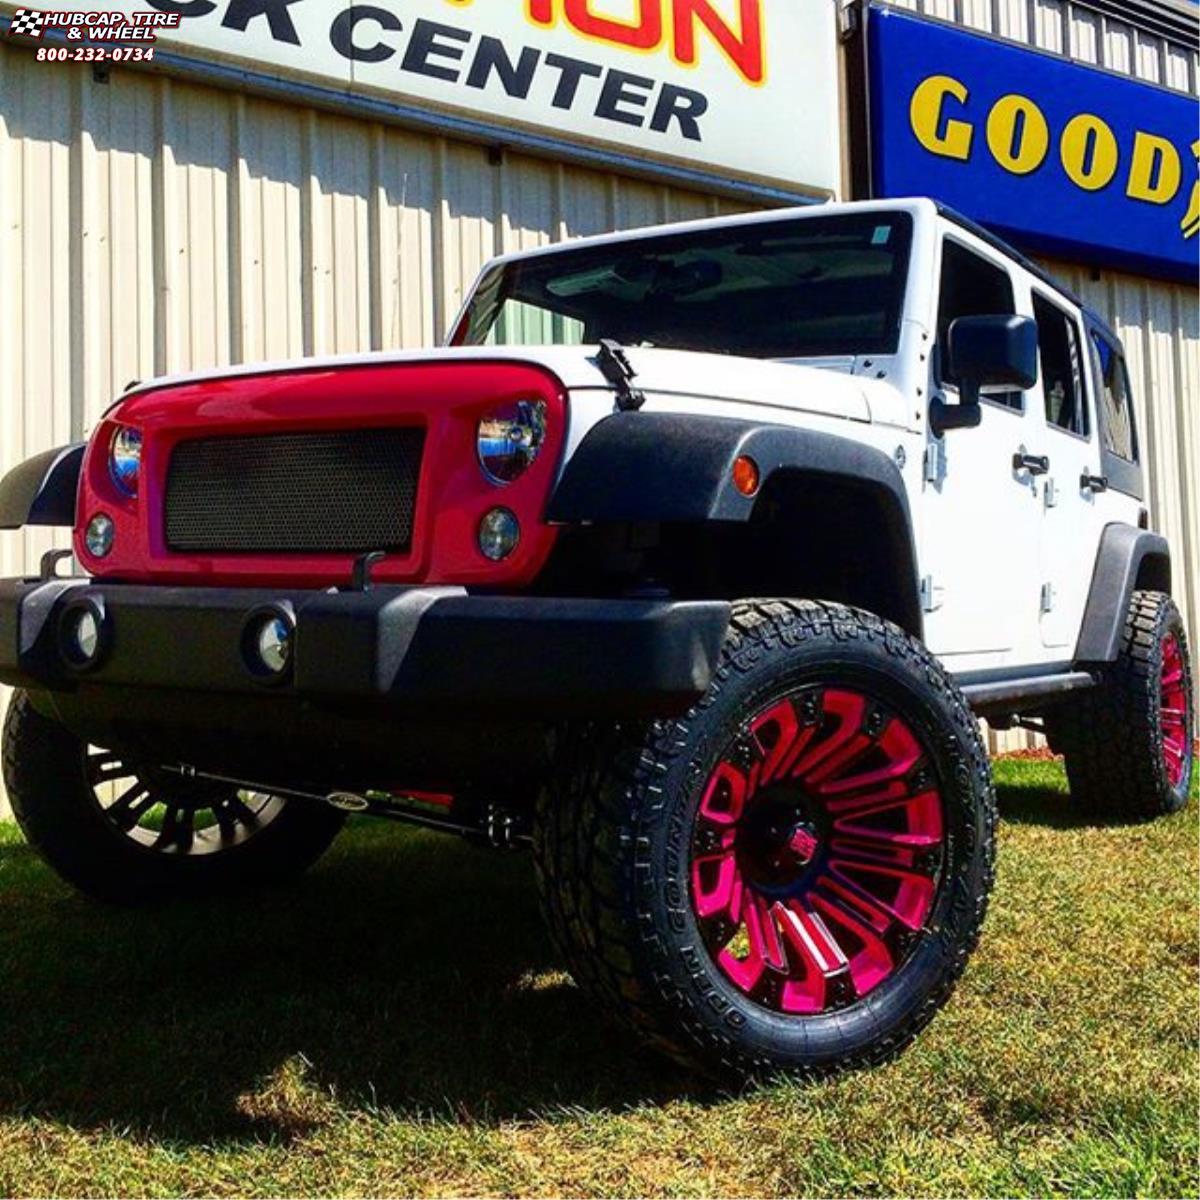 Jeep Wrangler Xd Series Xd810 Brigade Wheels Black Pink